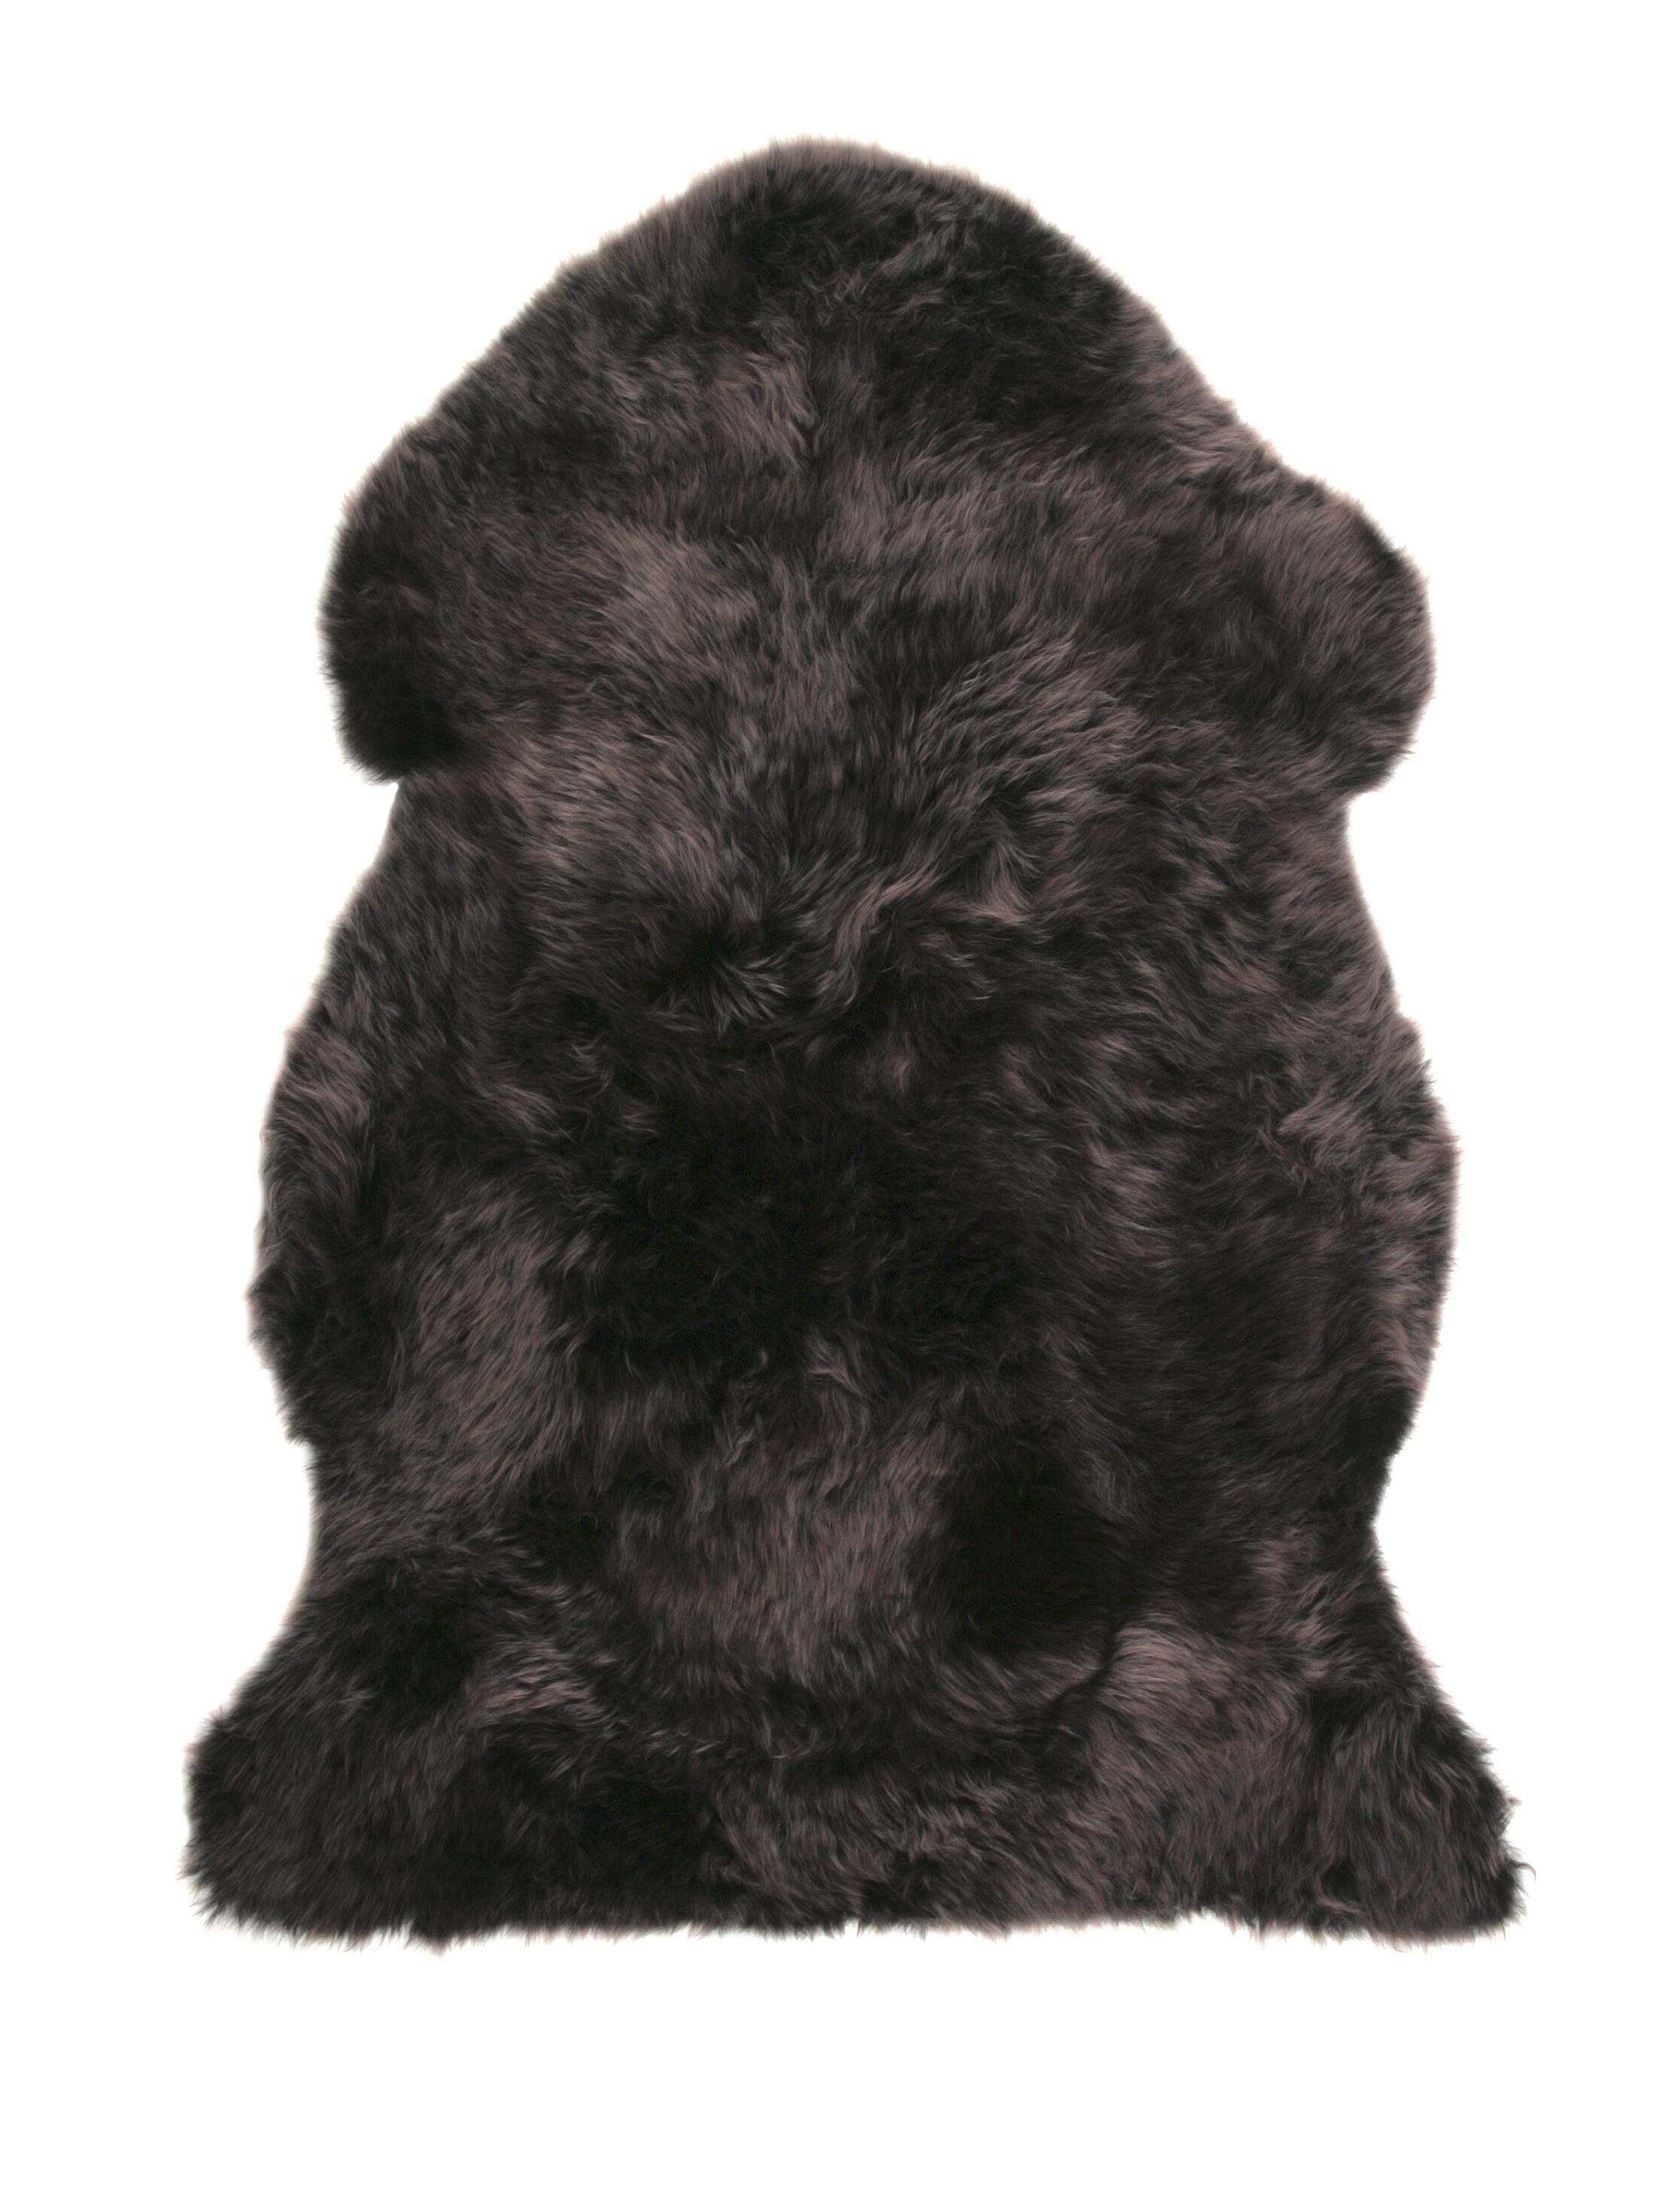 Sheepskin Walnut Area Rug Rug Size: Rectangle 2' x 3'